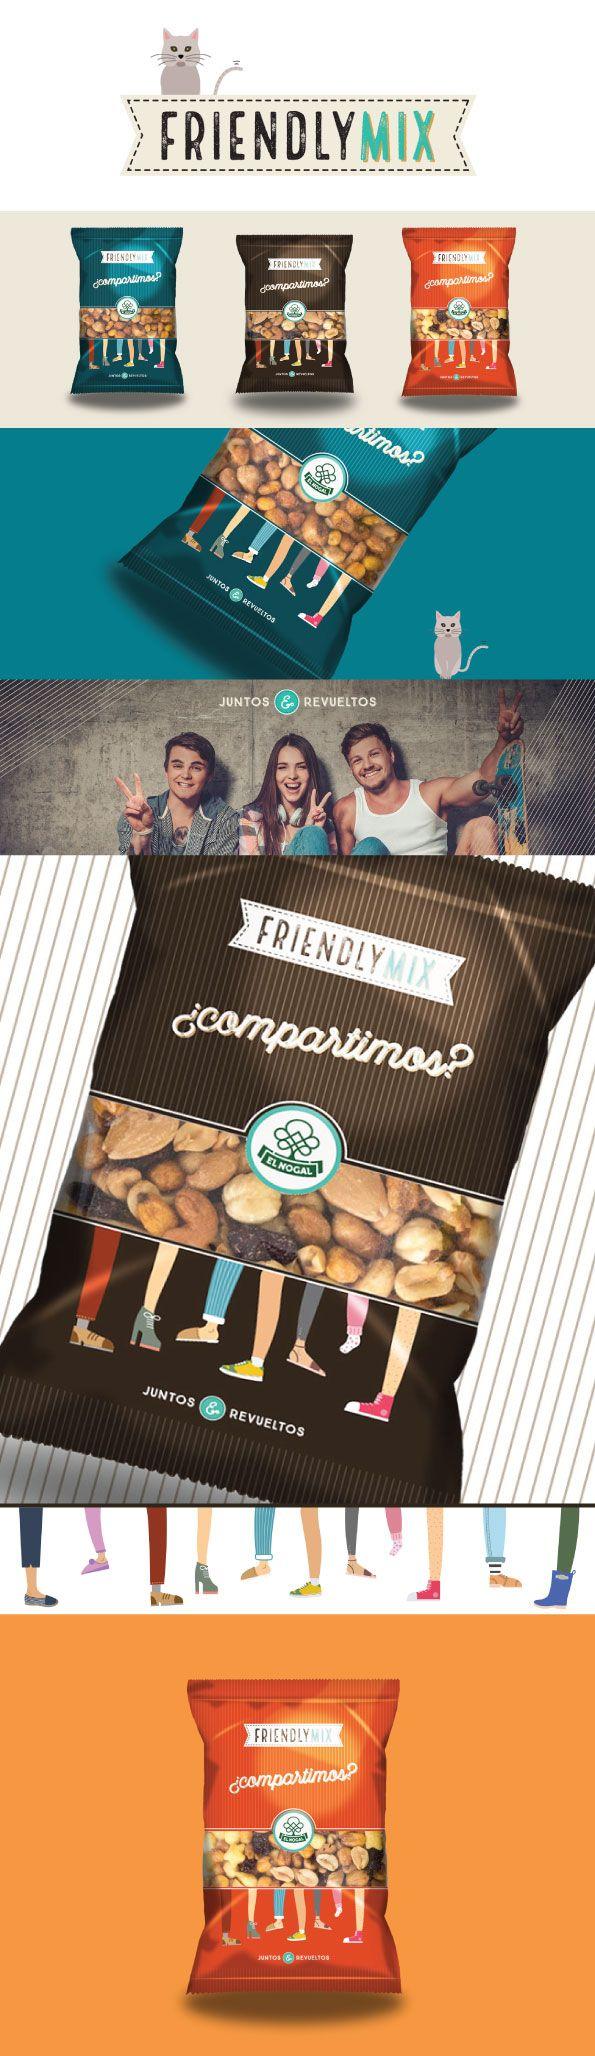 FriendlyMix El Nogal by Koolbrand #design #packaging #nut #cocktail #Nuts #Koolbrand